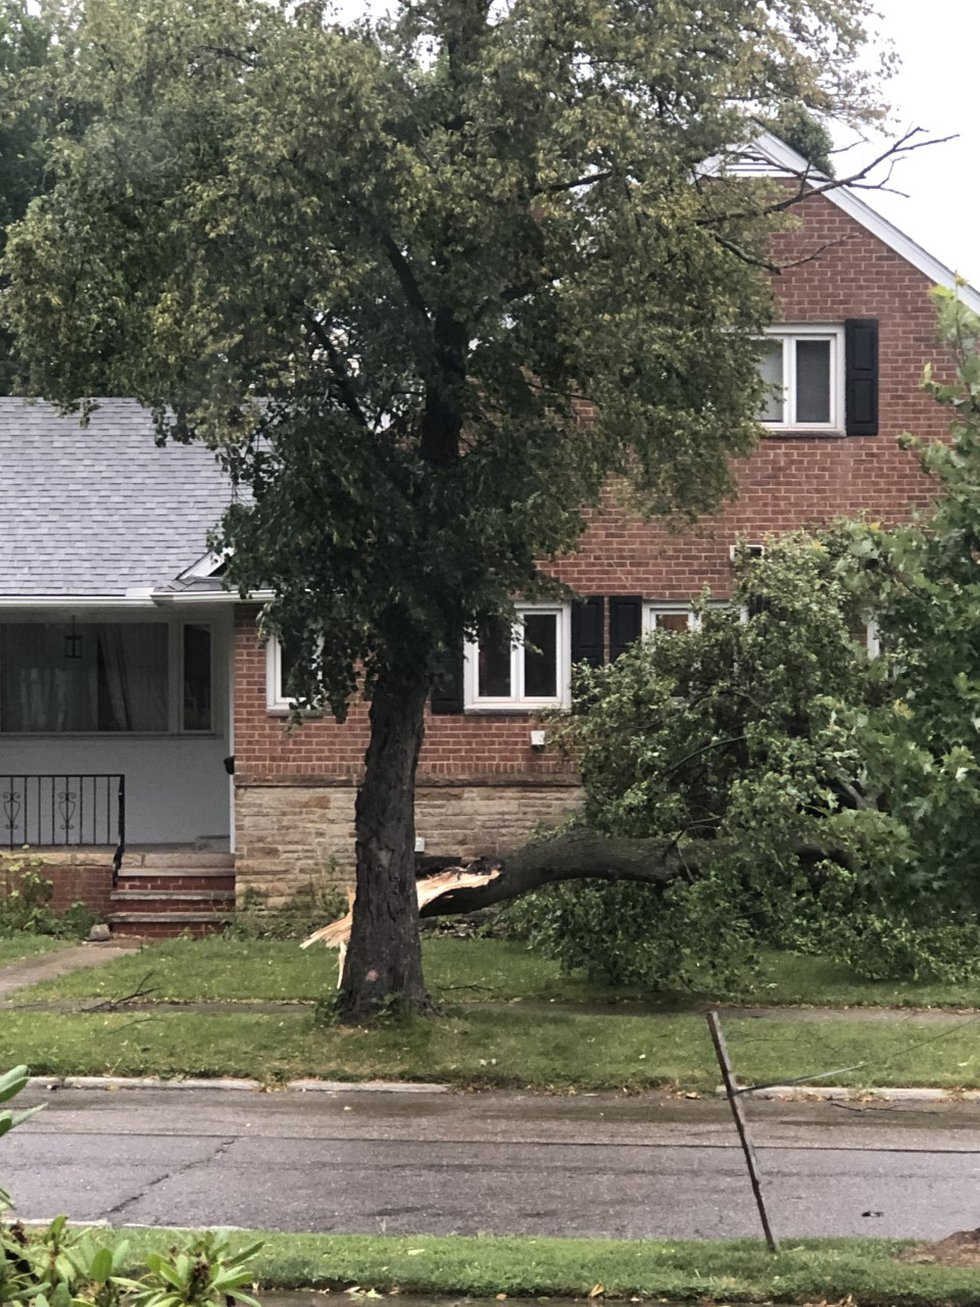 Aug. 11, 2021 storm damage: University Heights